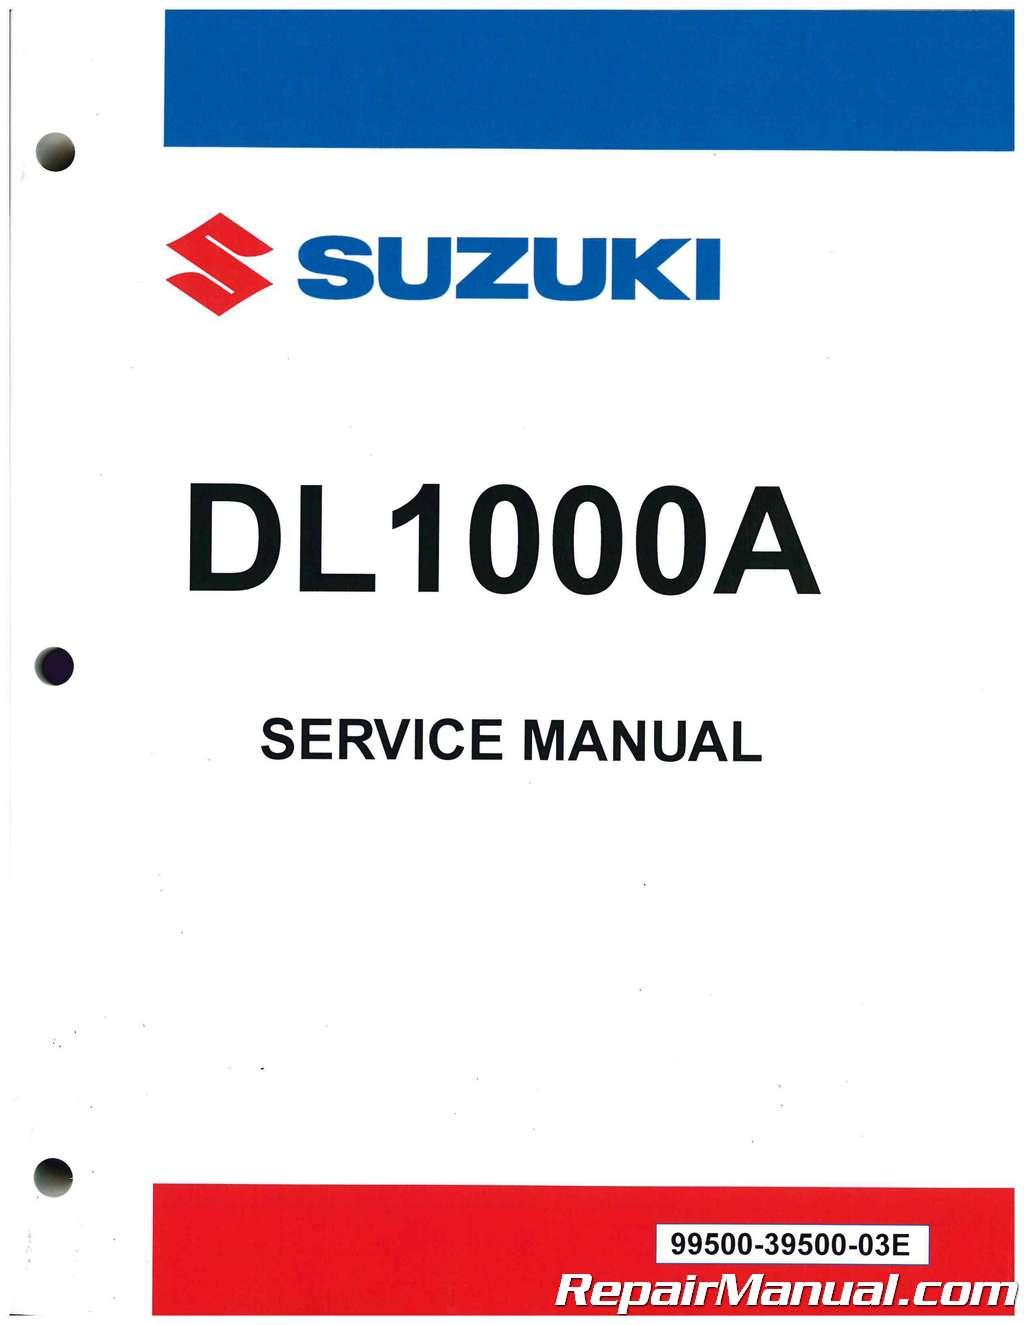 2014 2018 suzuki dl1000a v strom motorcycle service manual rh repairmanual com suzuki v strom manual pdf suzuki v strom shop manual